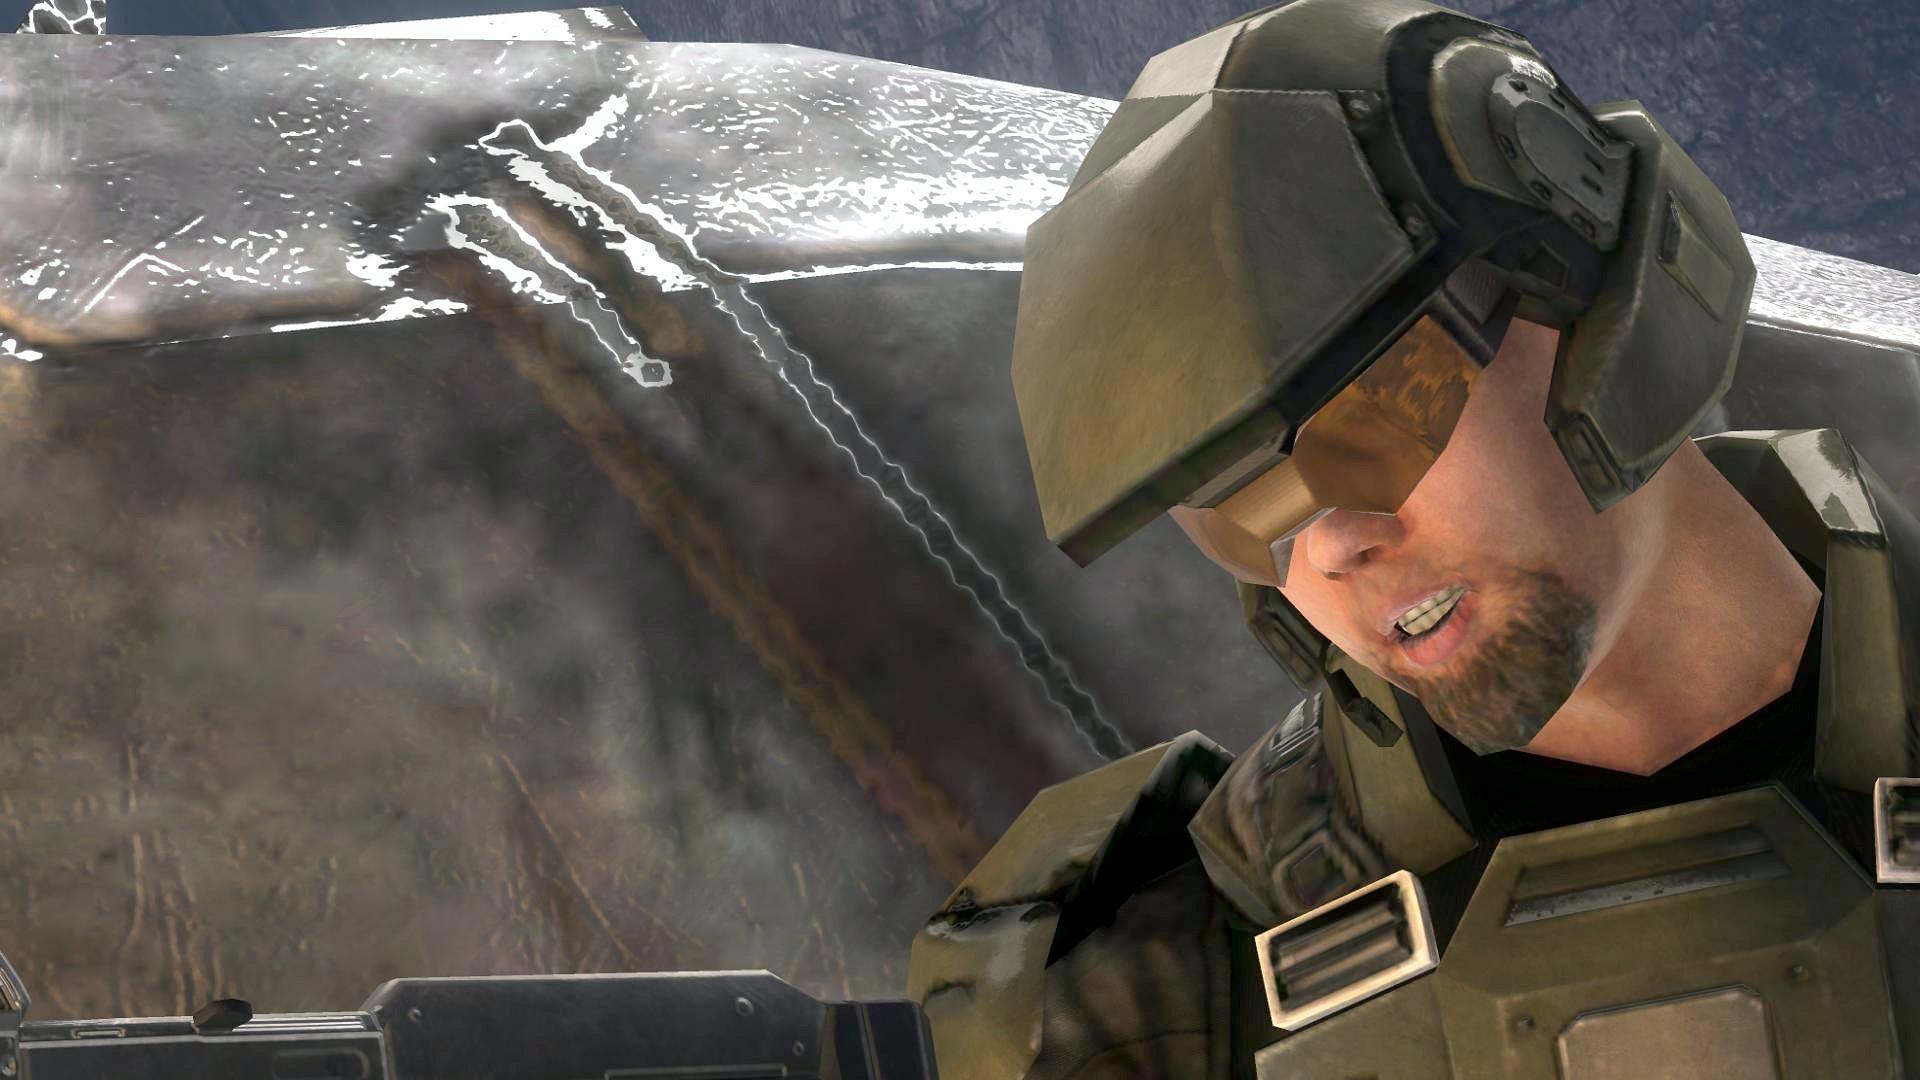 2057159178 2ff0c5fe46 o Halo 3: Lets Go!